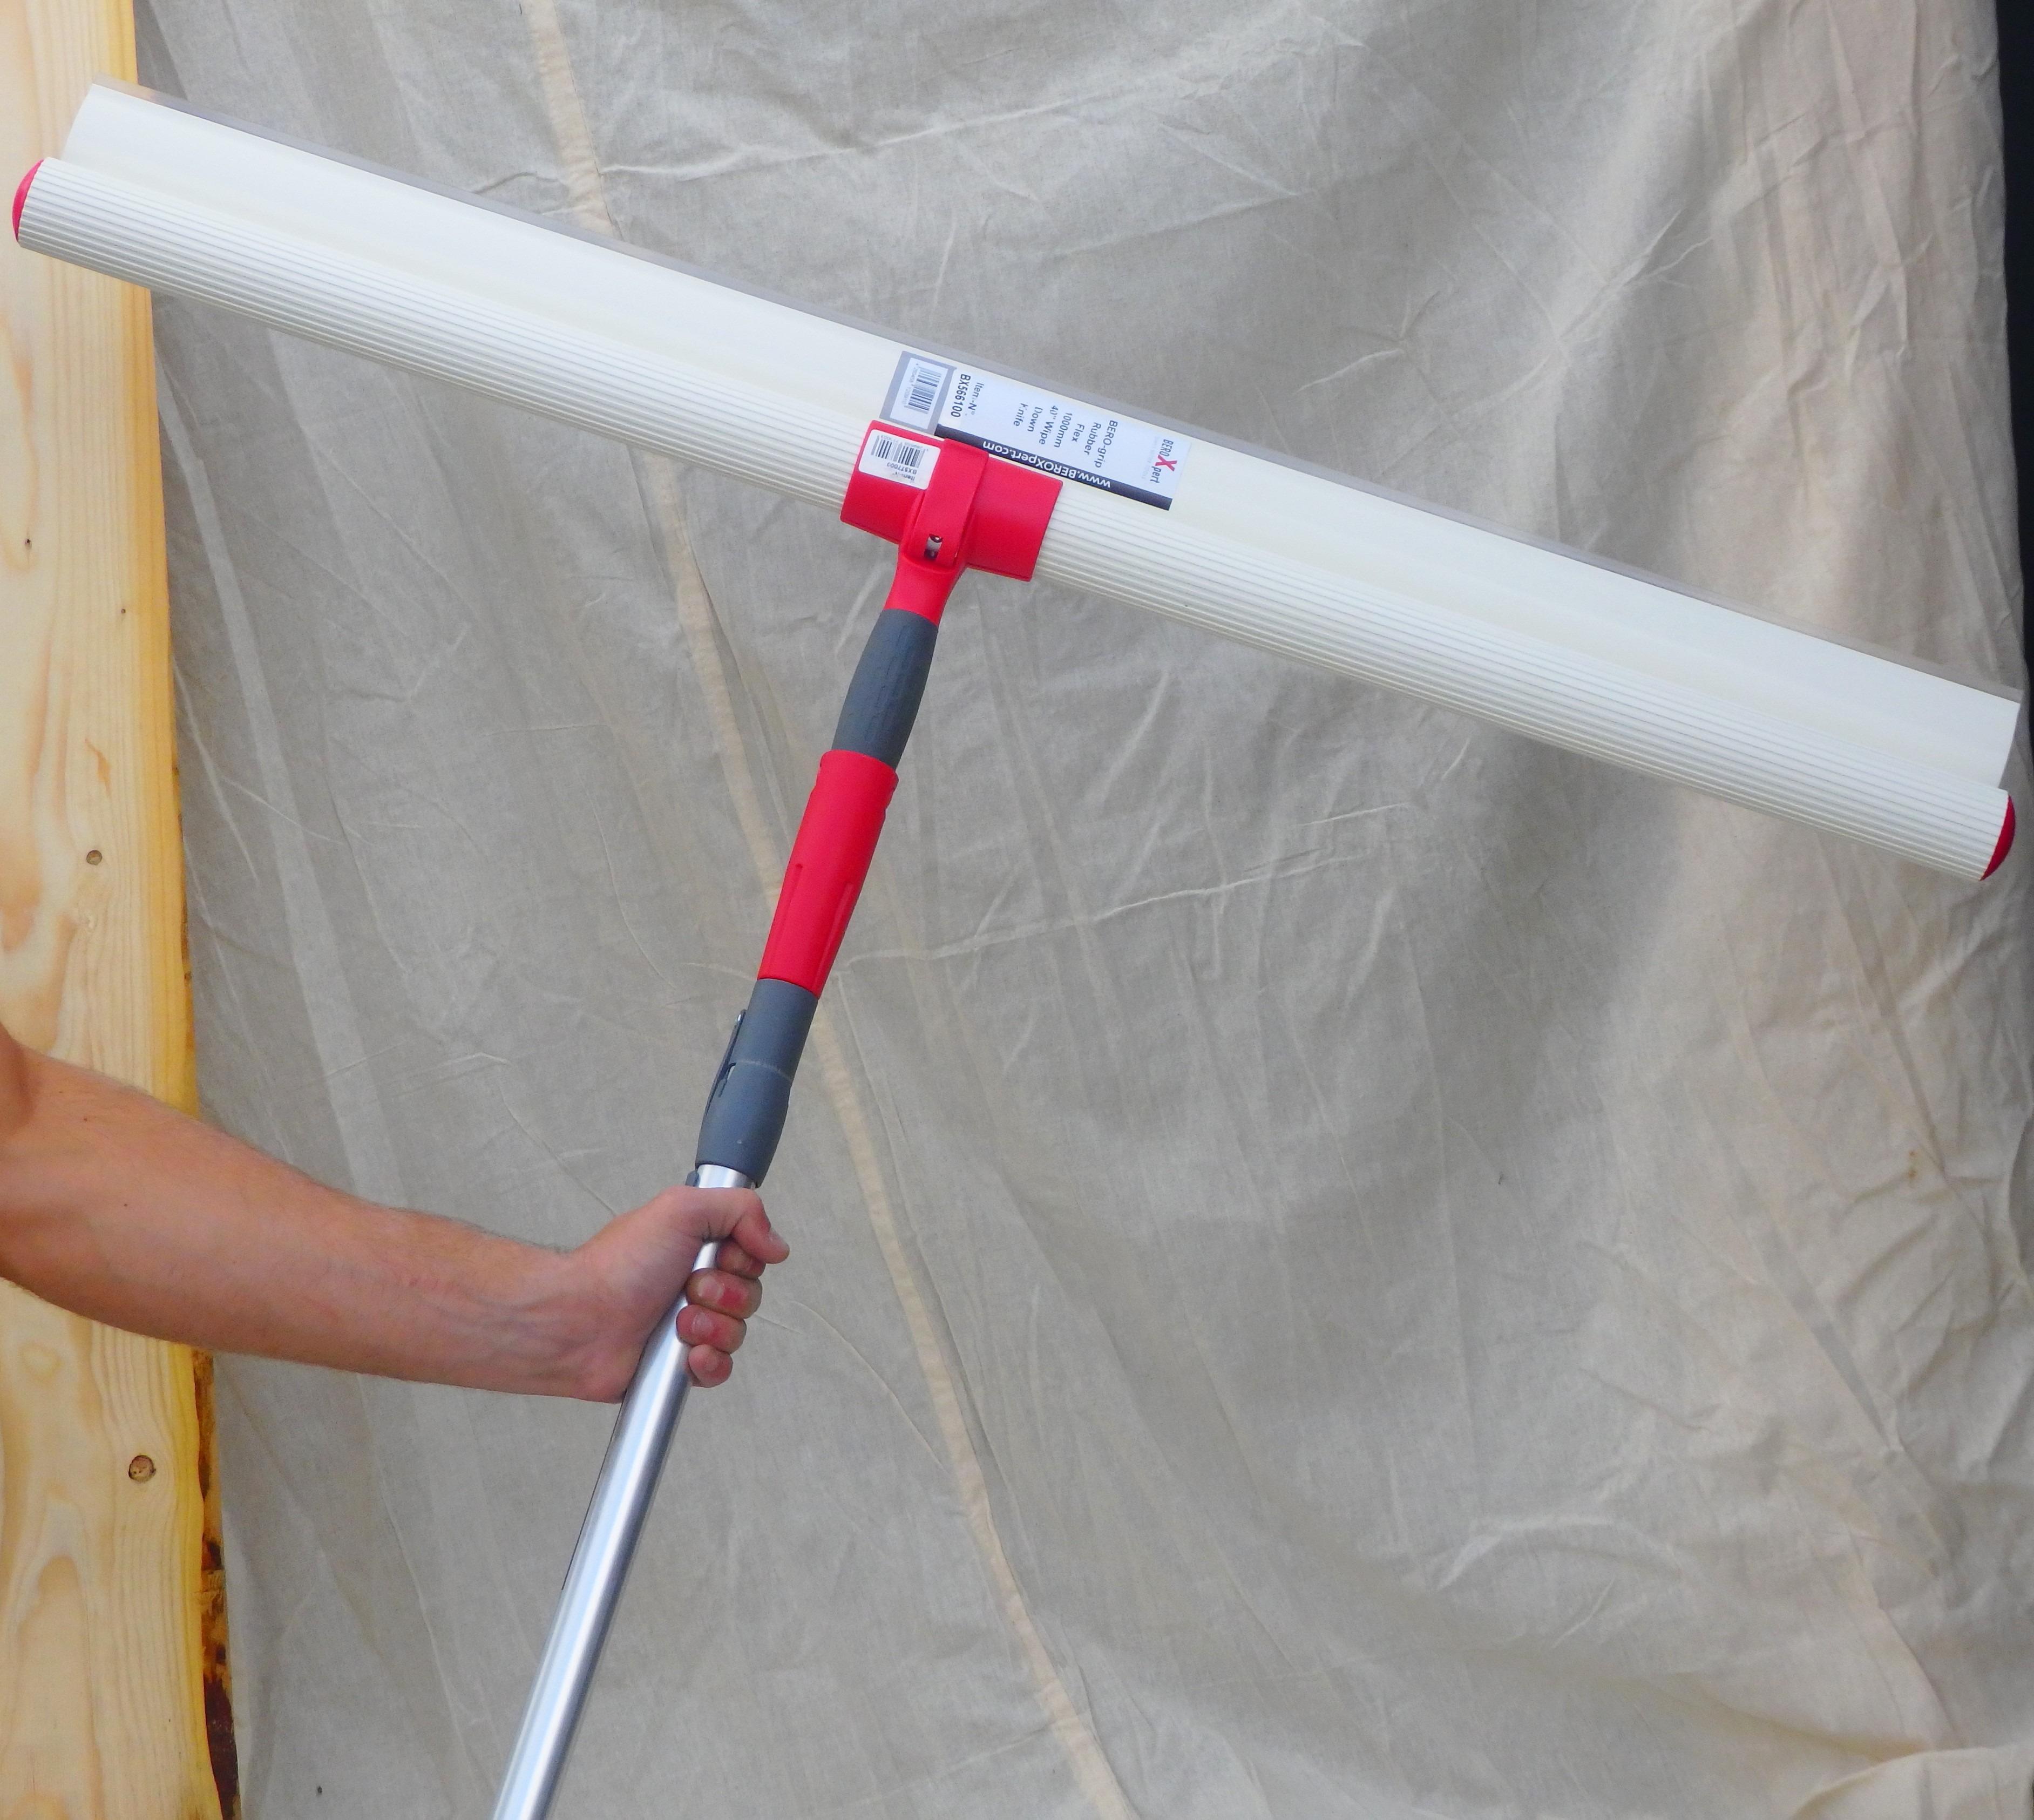 Beroflex Skimflex Flexible Skimming Amp Rendering Spatula